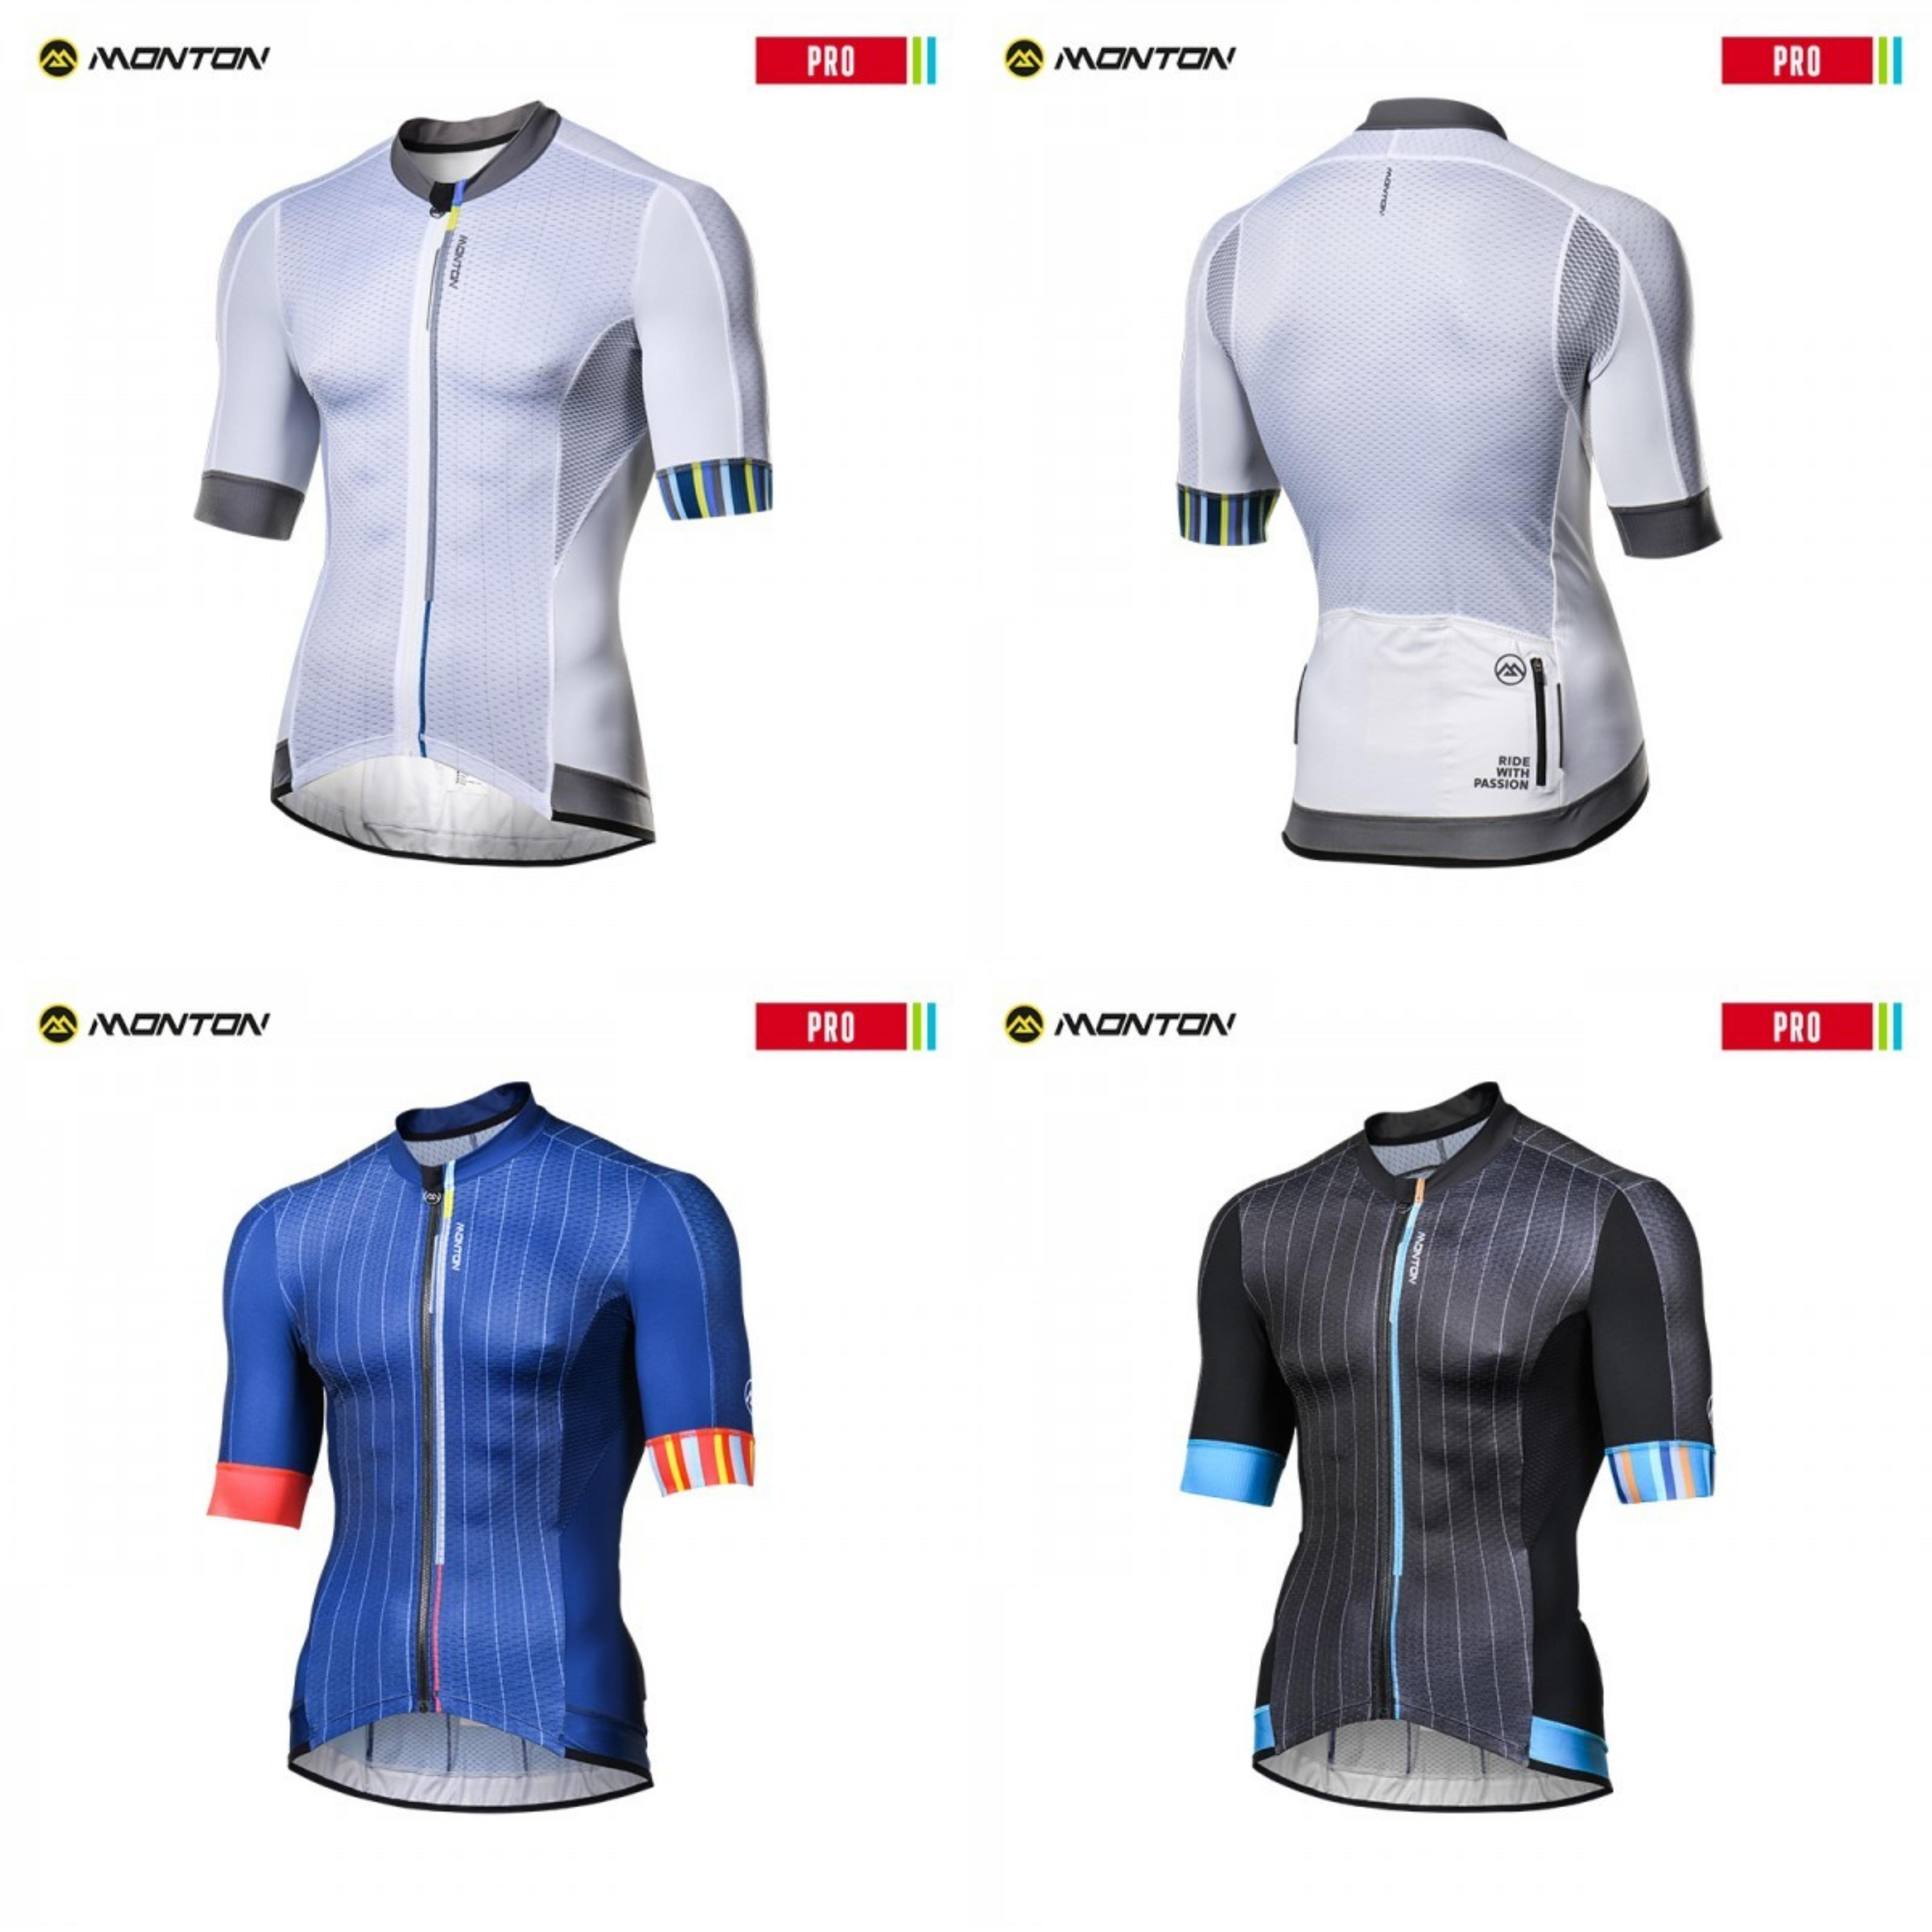 2018 Bike Jersey Men PRO Gessato Blac (end 9 4 2020 4 15 PM) 73205838f